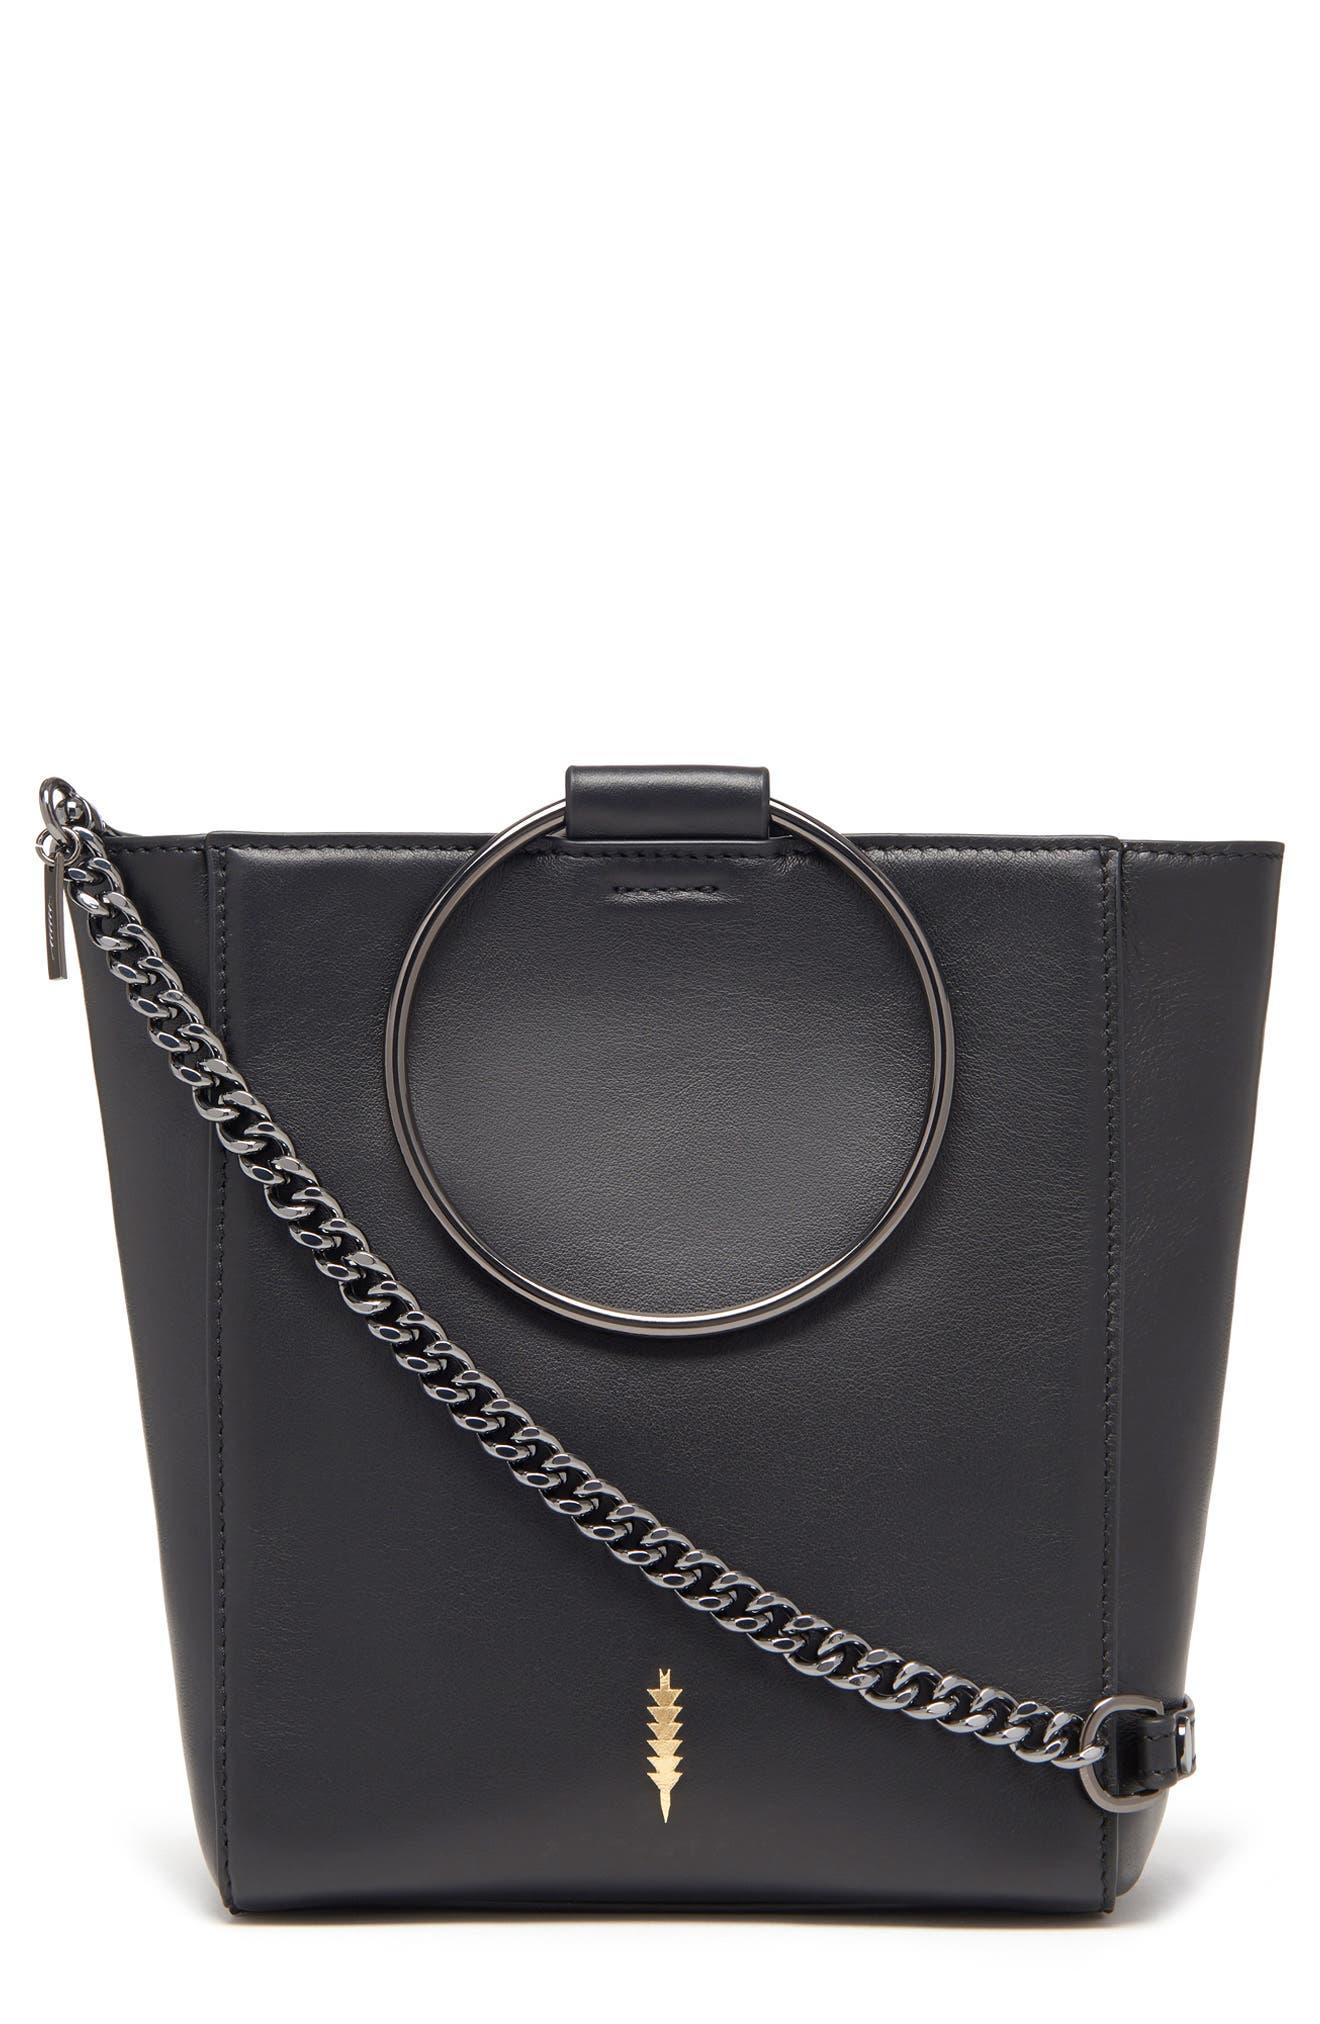 THACKER Le Bucket Leather Bag, Main, color, BLACK/ GUNMETAL